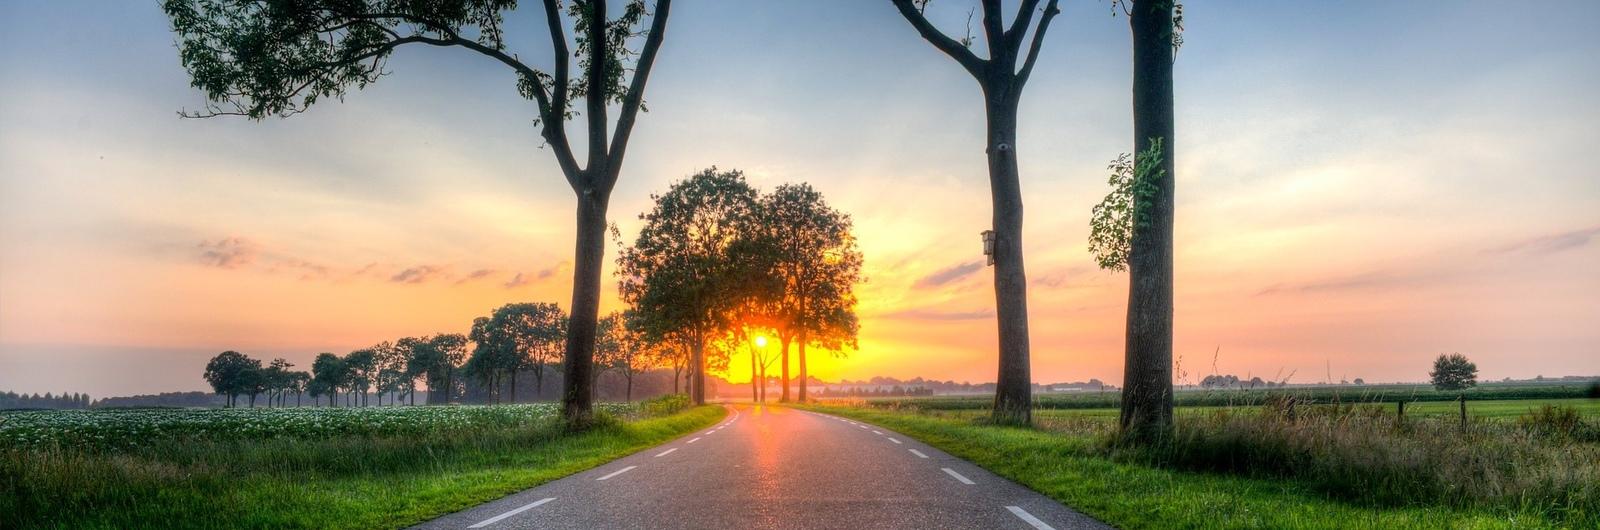 city header netherlands road sunset